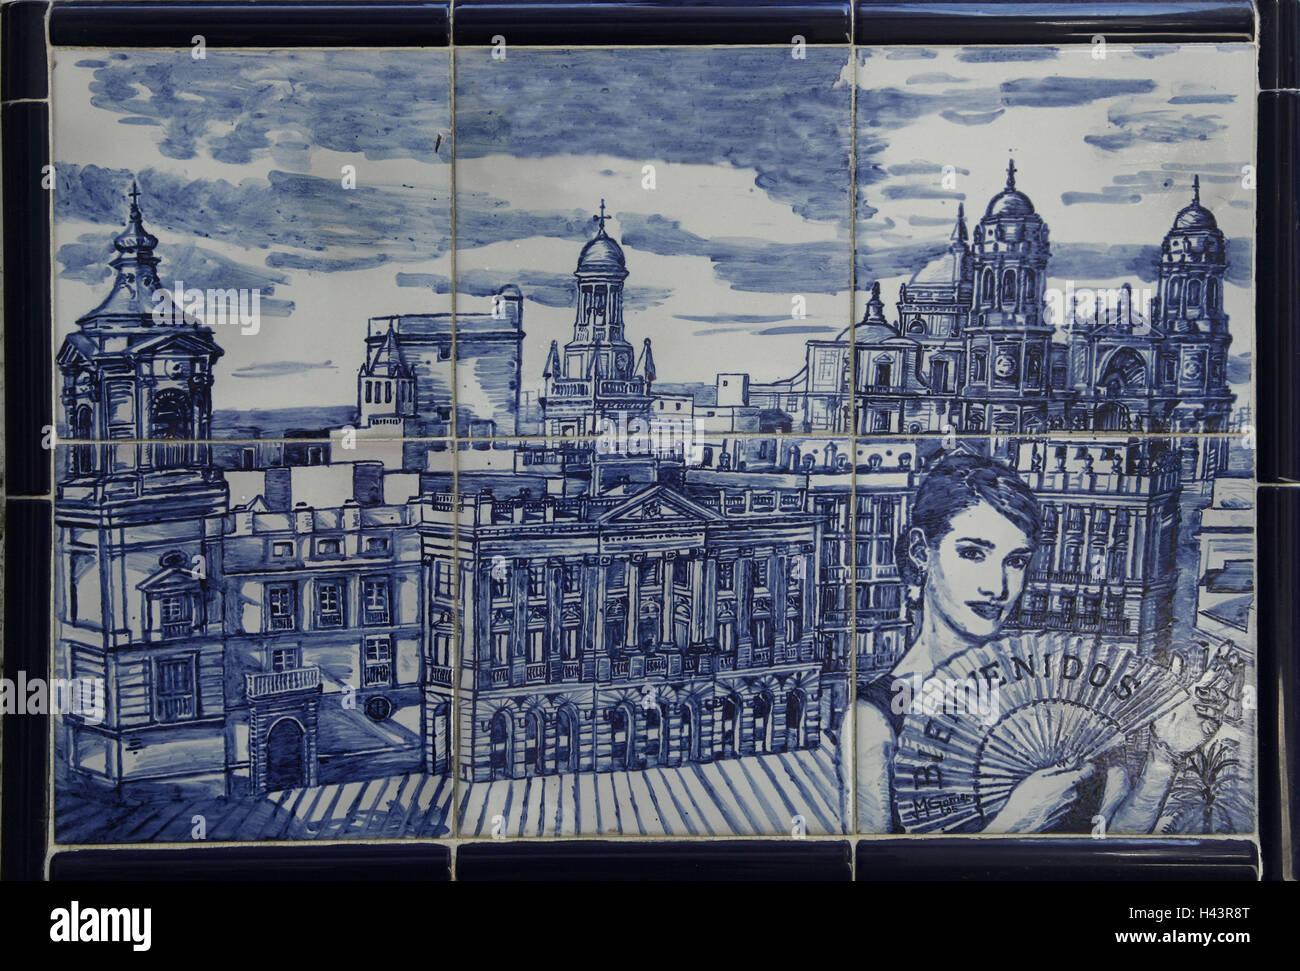 Faience painting stock photos faience painting stock for Azulejos cadiz